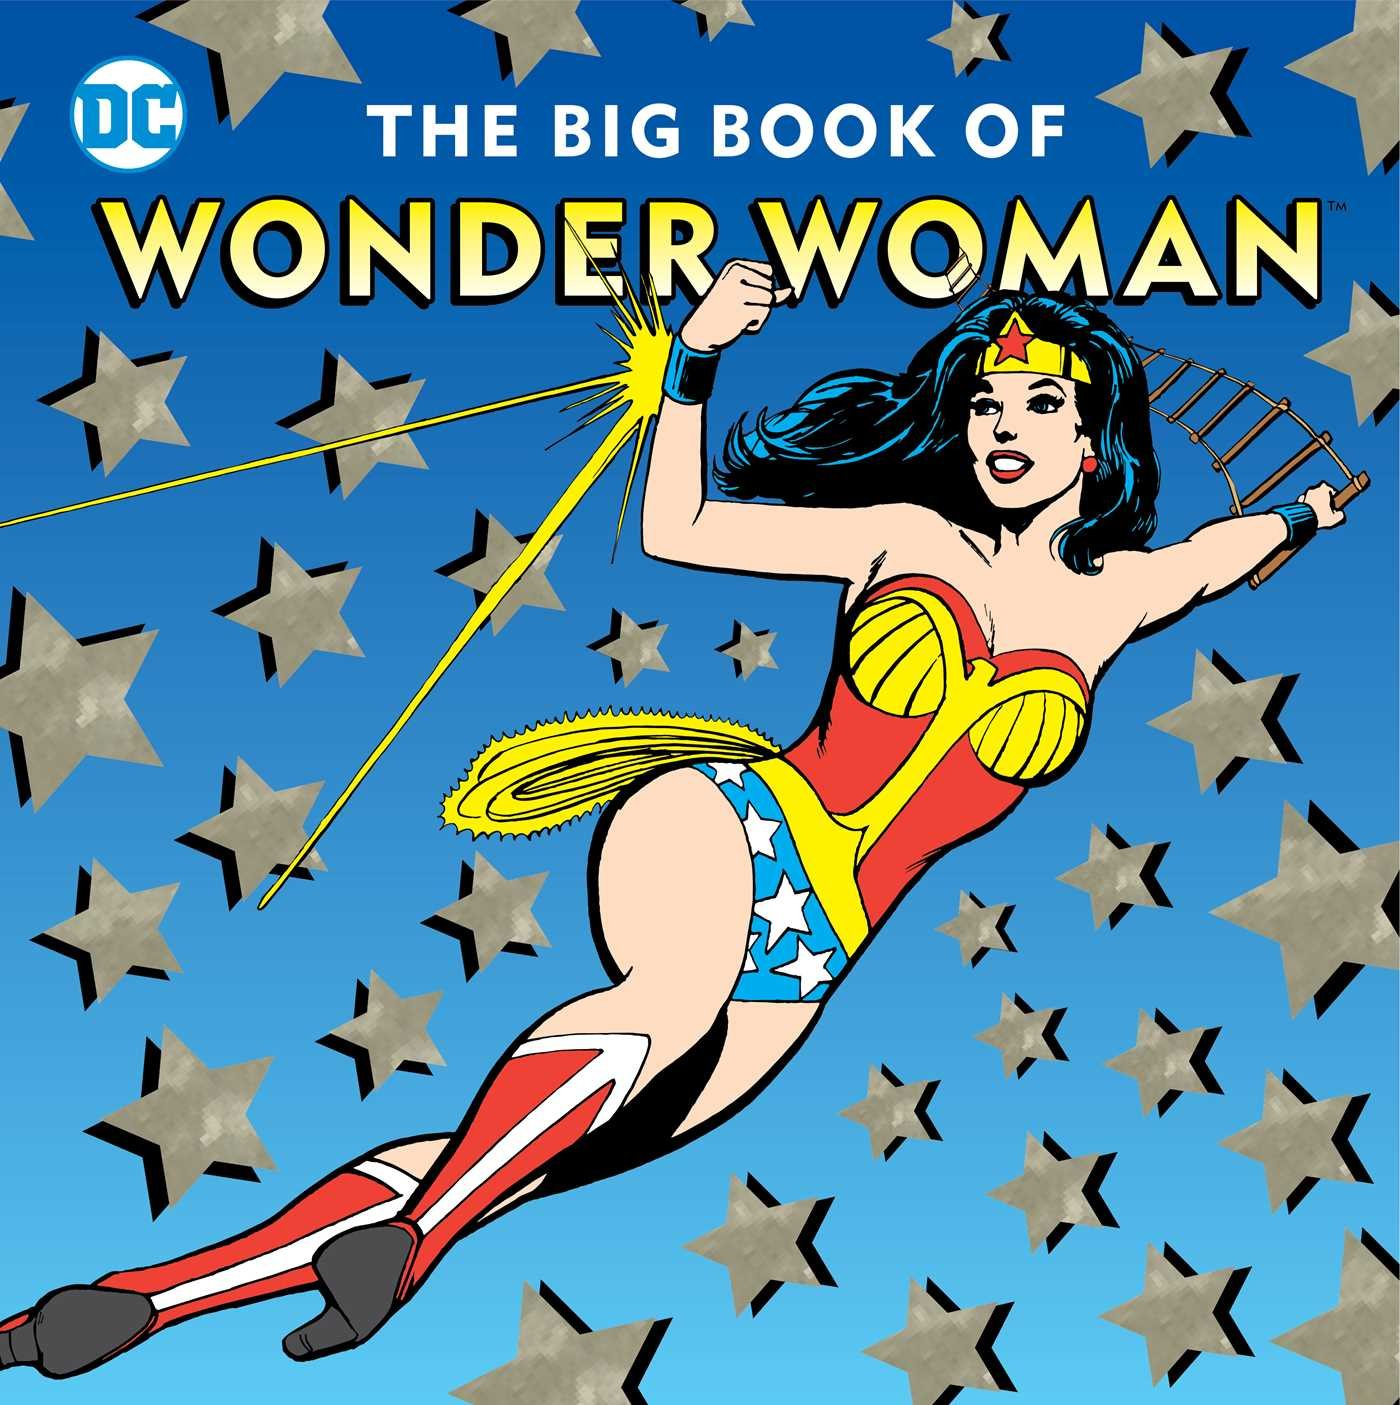 The Big Book of Wonder Woman (DC Super Heroes)